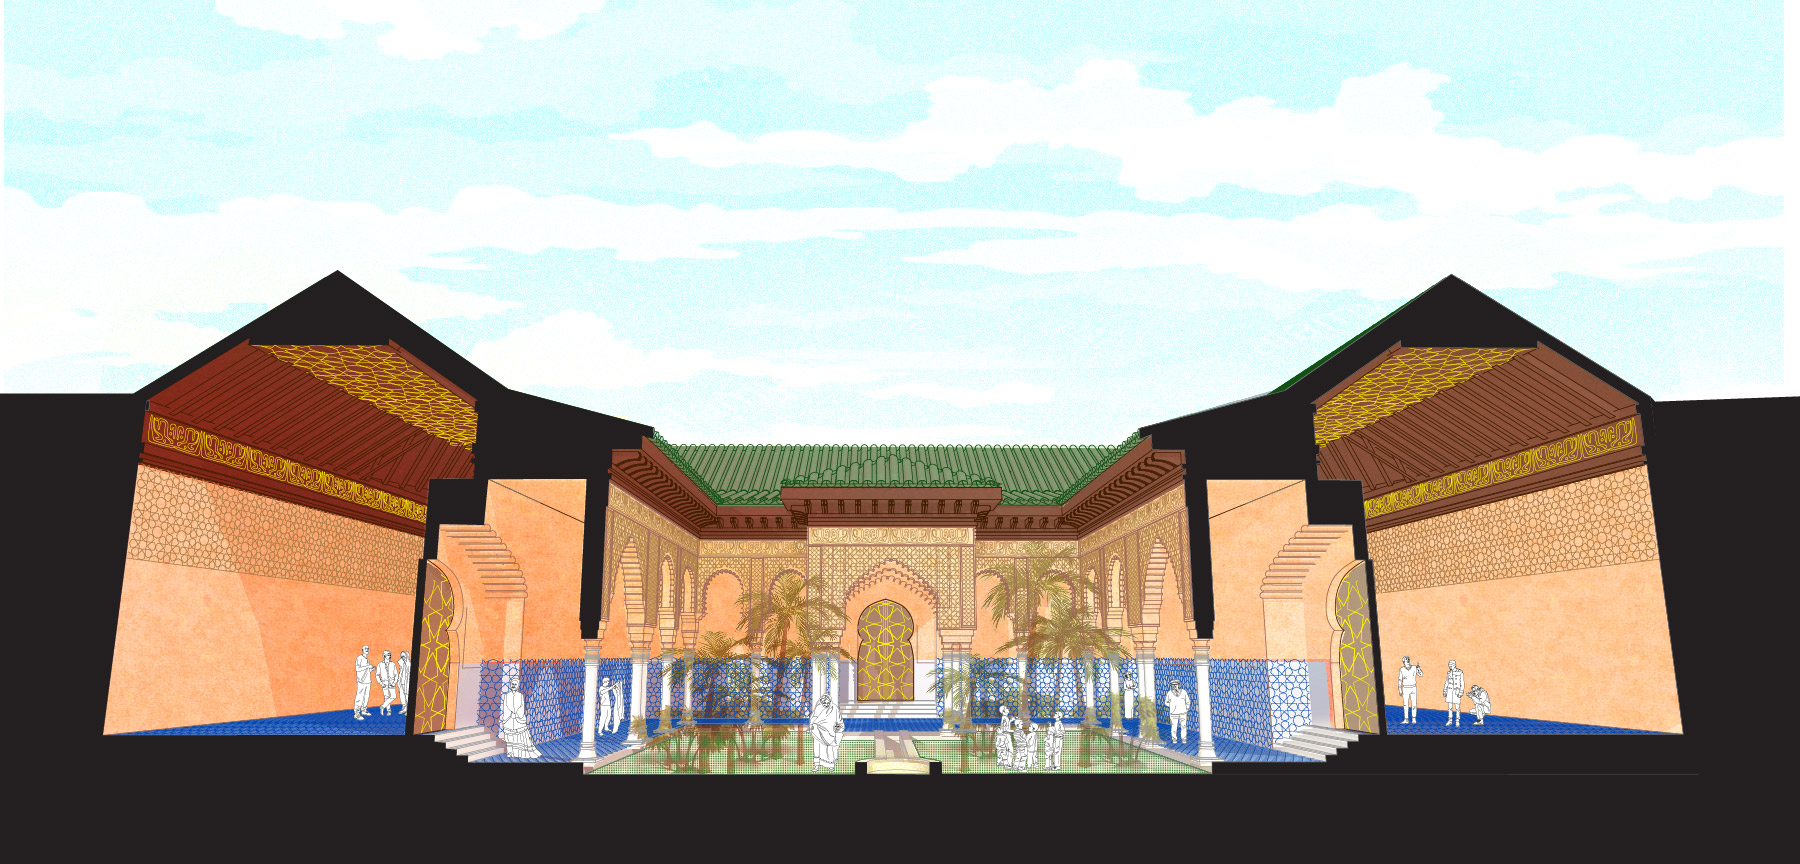 ELEMENTS OF MOORISH DESIGN: Ceramic, Stucco, Cedar in a Moroccan Palace